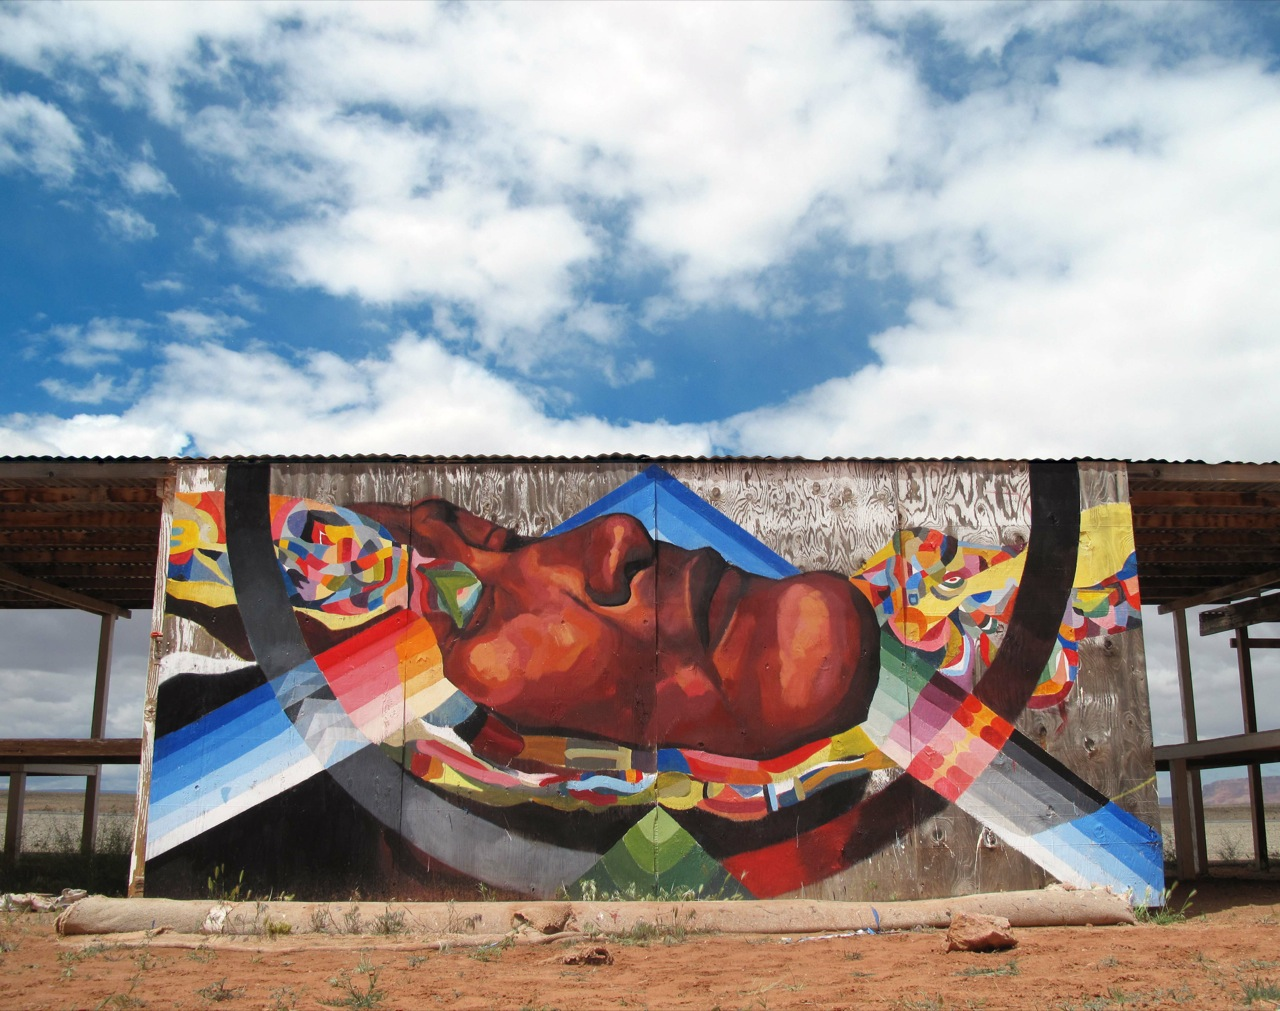 Ever new mural in arizona usa streetartnews streetartnews for American mural project